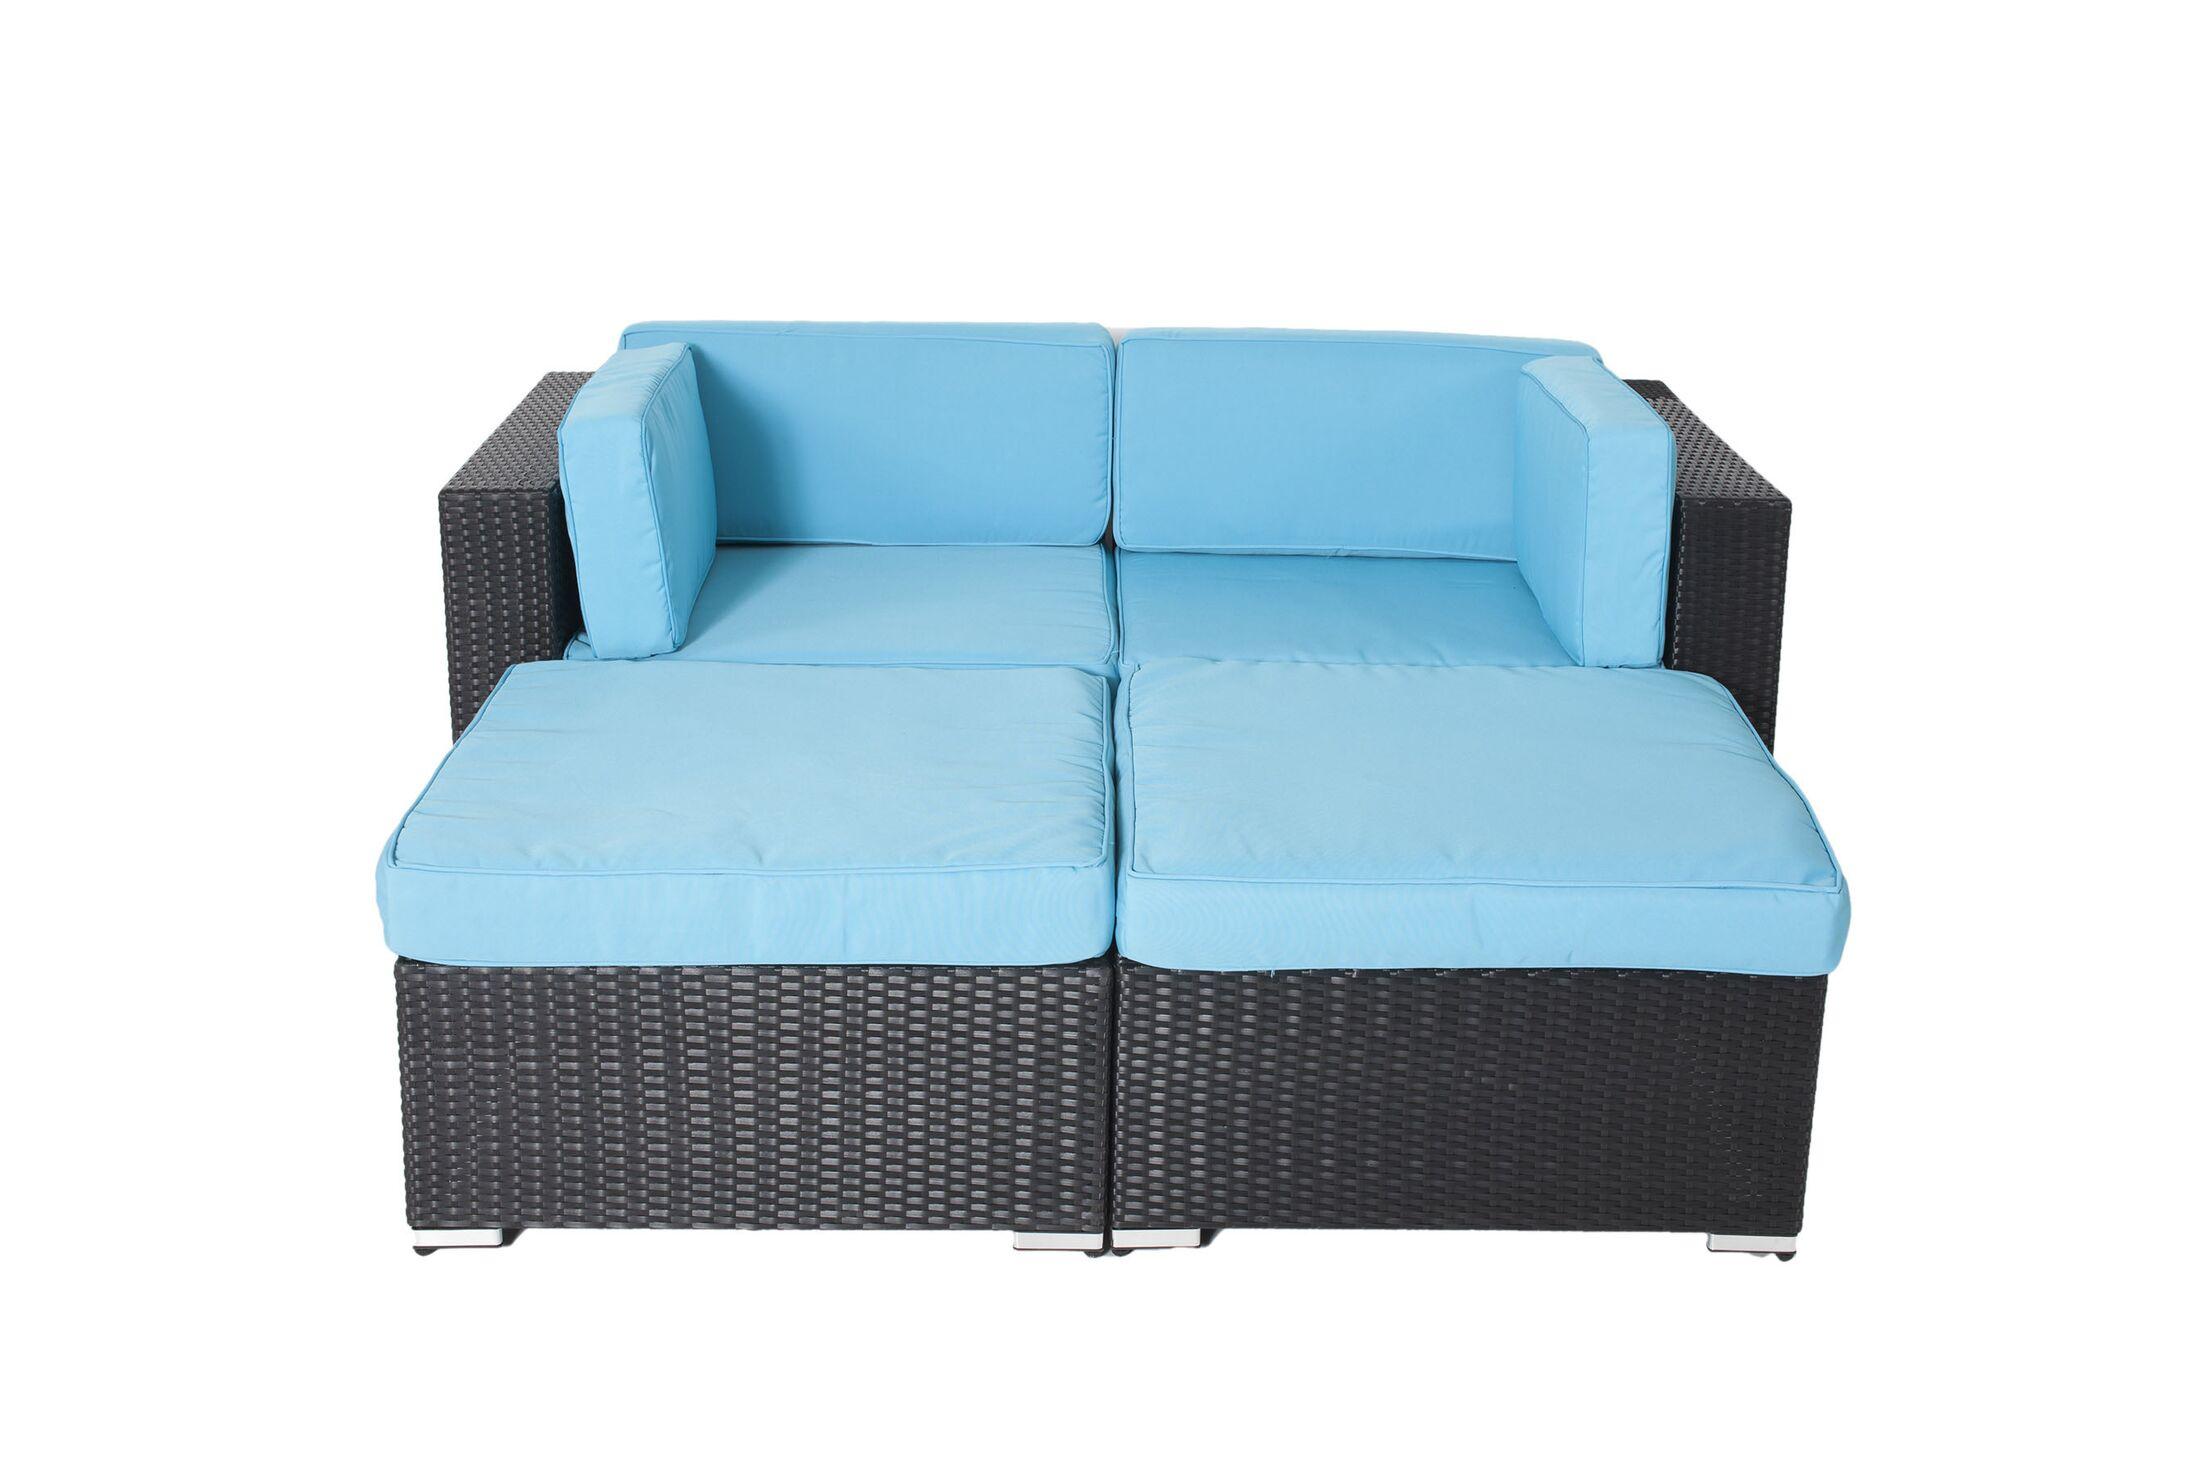 Hibner 4 Piece Rattan Conversation Set with Cushions Fabric: Turuoise